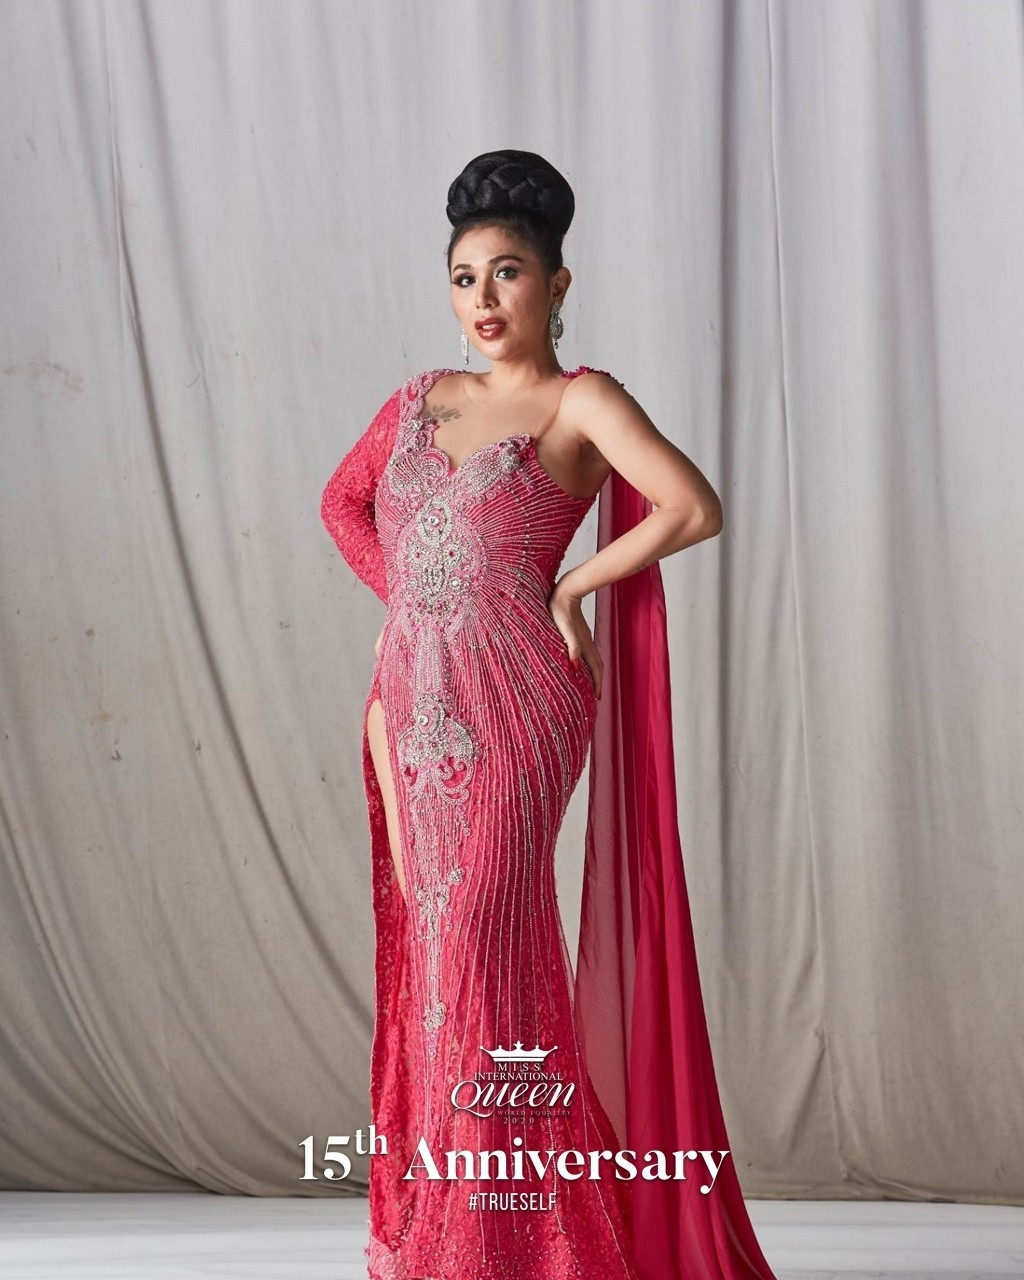 candidatas a miss international queen 2020. final: 7 marso. sede permanente: thailand. IPpBTg